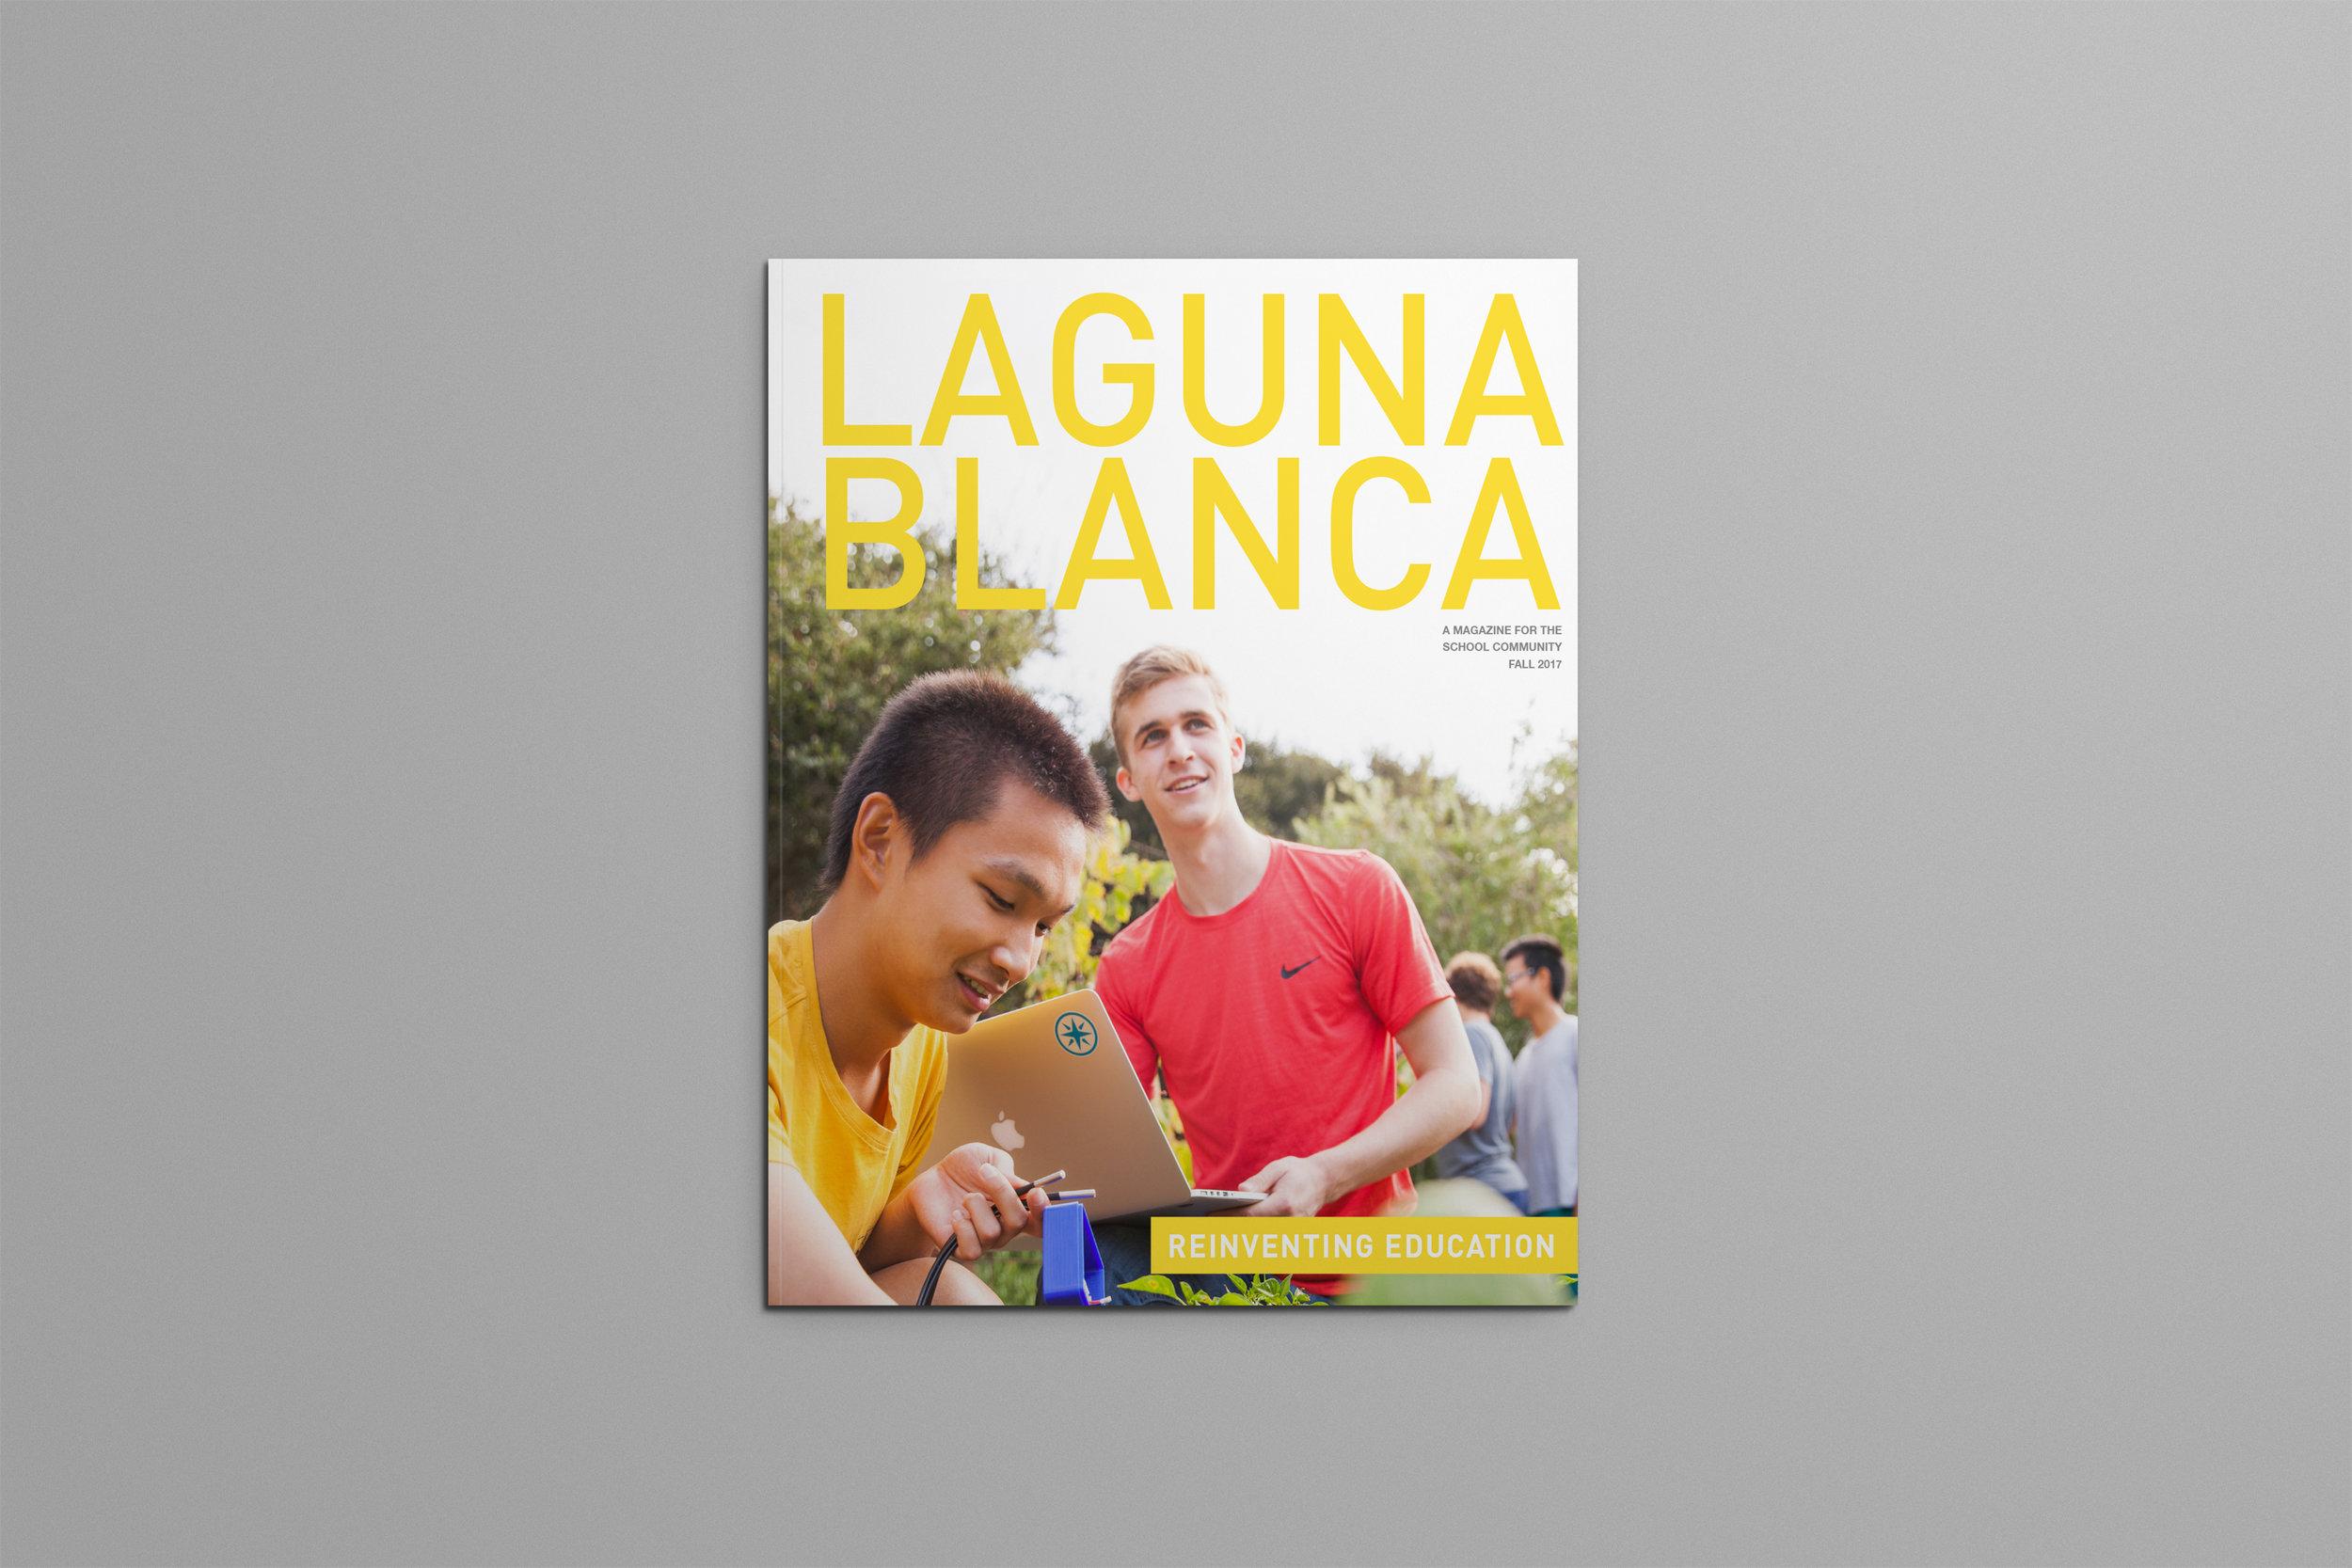 Laguna blanca magazines | Layout design  FALL 2017  and  spring 2017